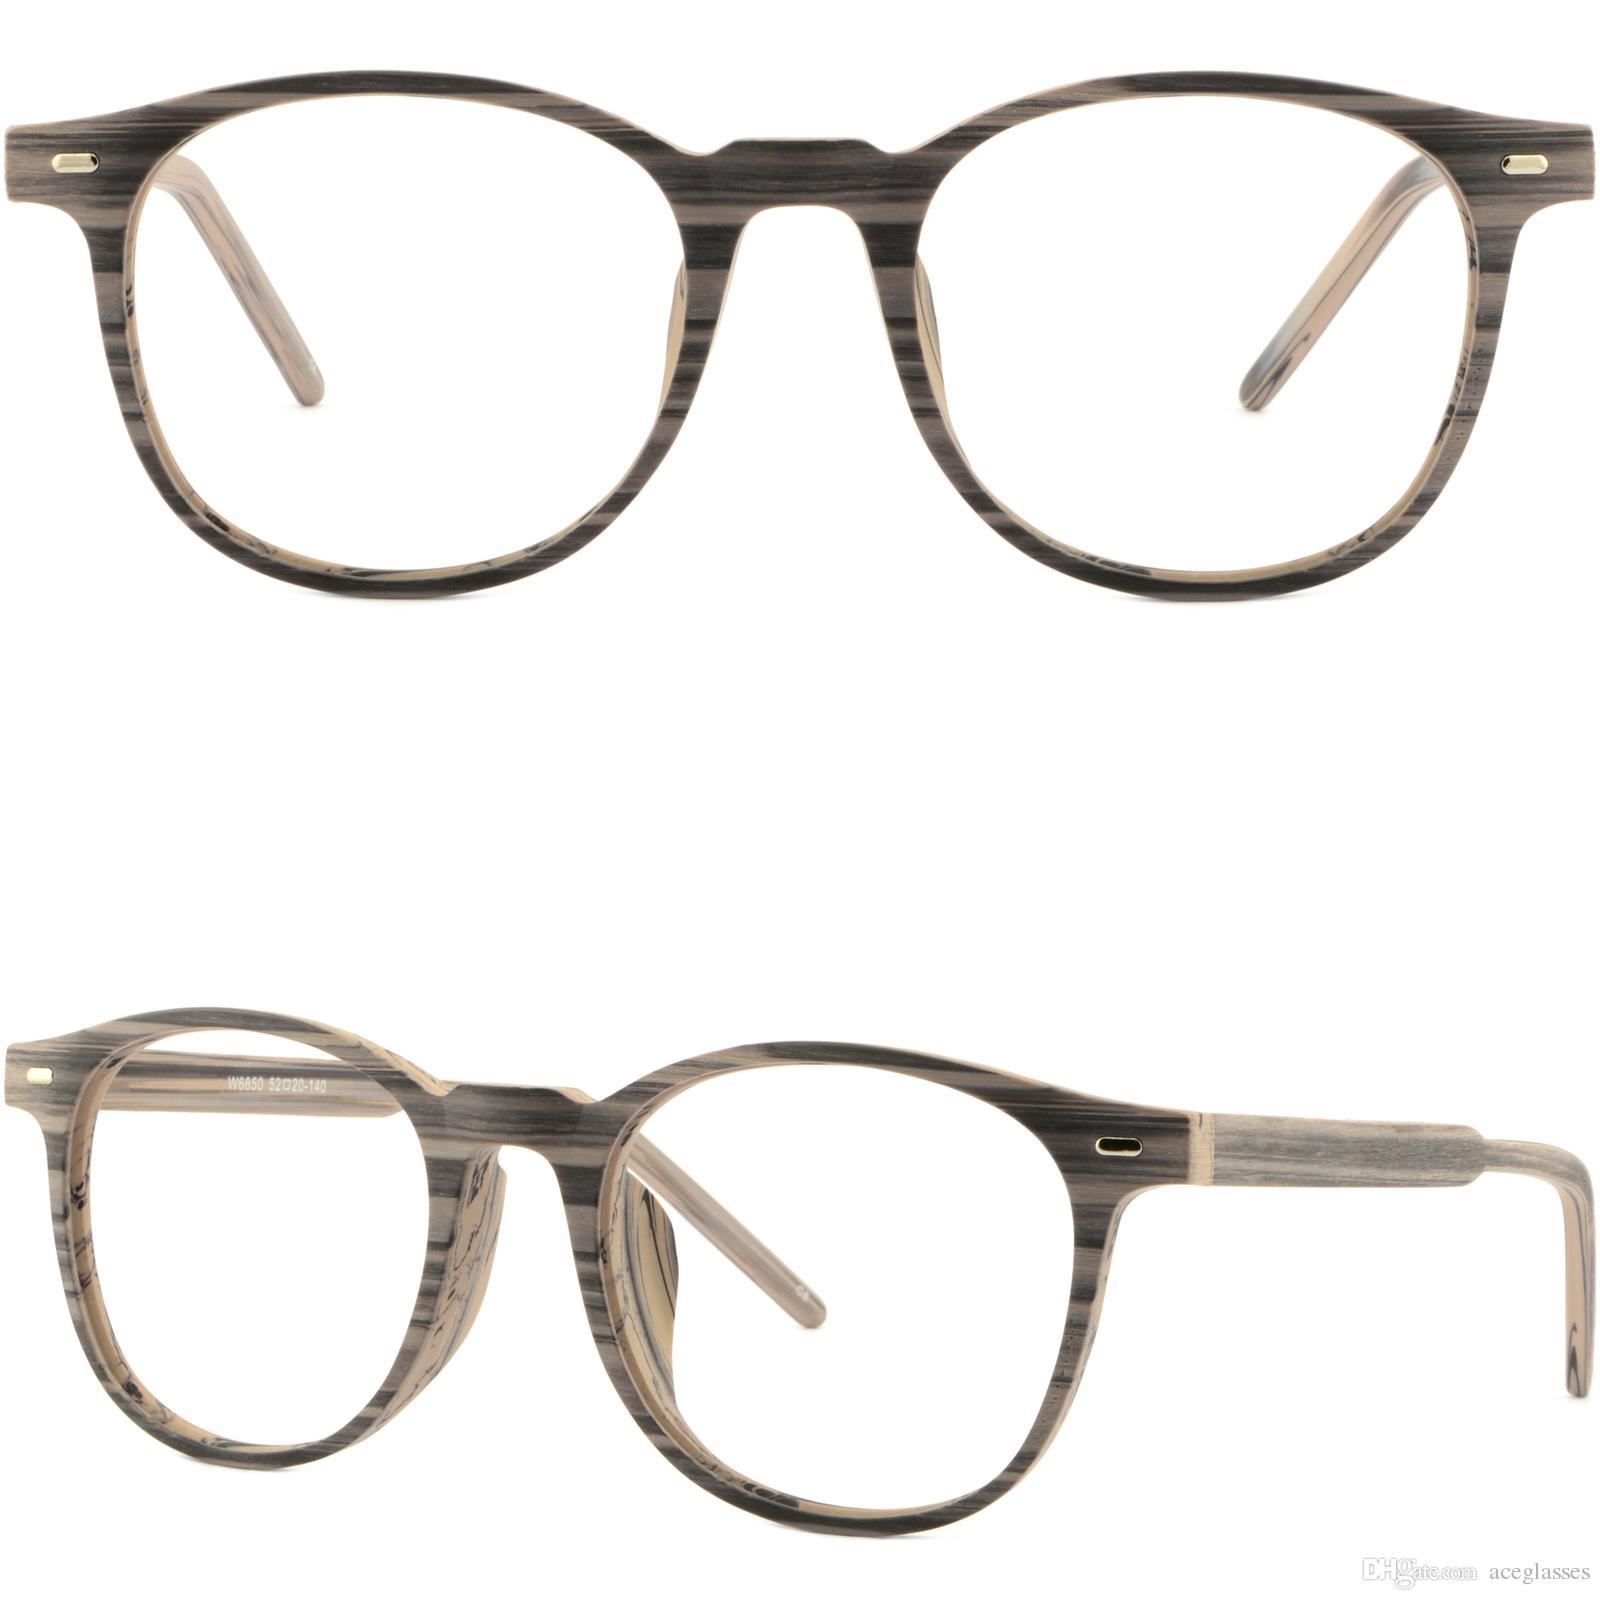 a73e79e610adc Brillengestell Fassung Square Mens Women Frames Wood Grain Acetate  Prescription Glasses Sunglasses Grey Nerd Glasses Frames Plastic Frames  From Aceglasses